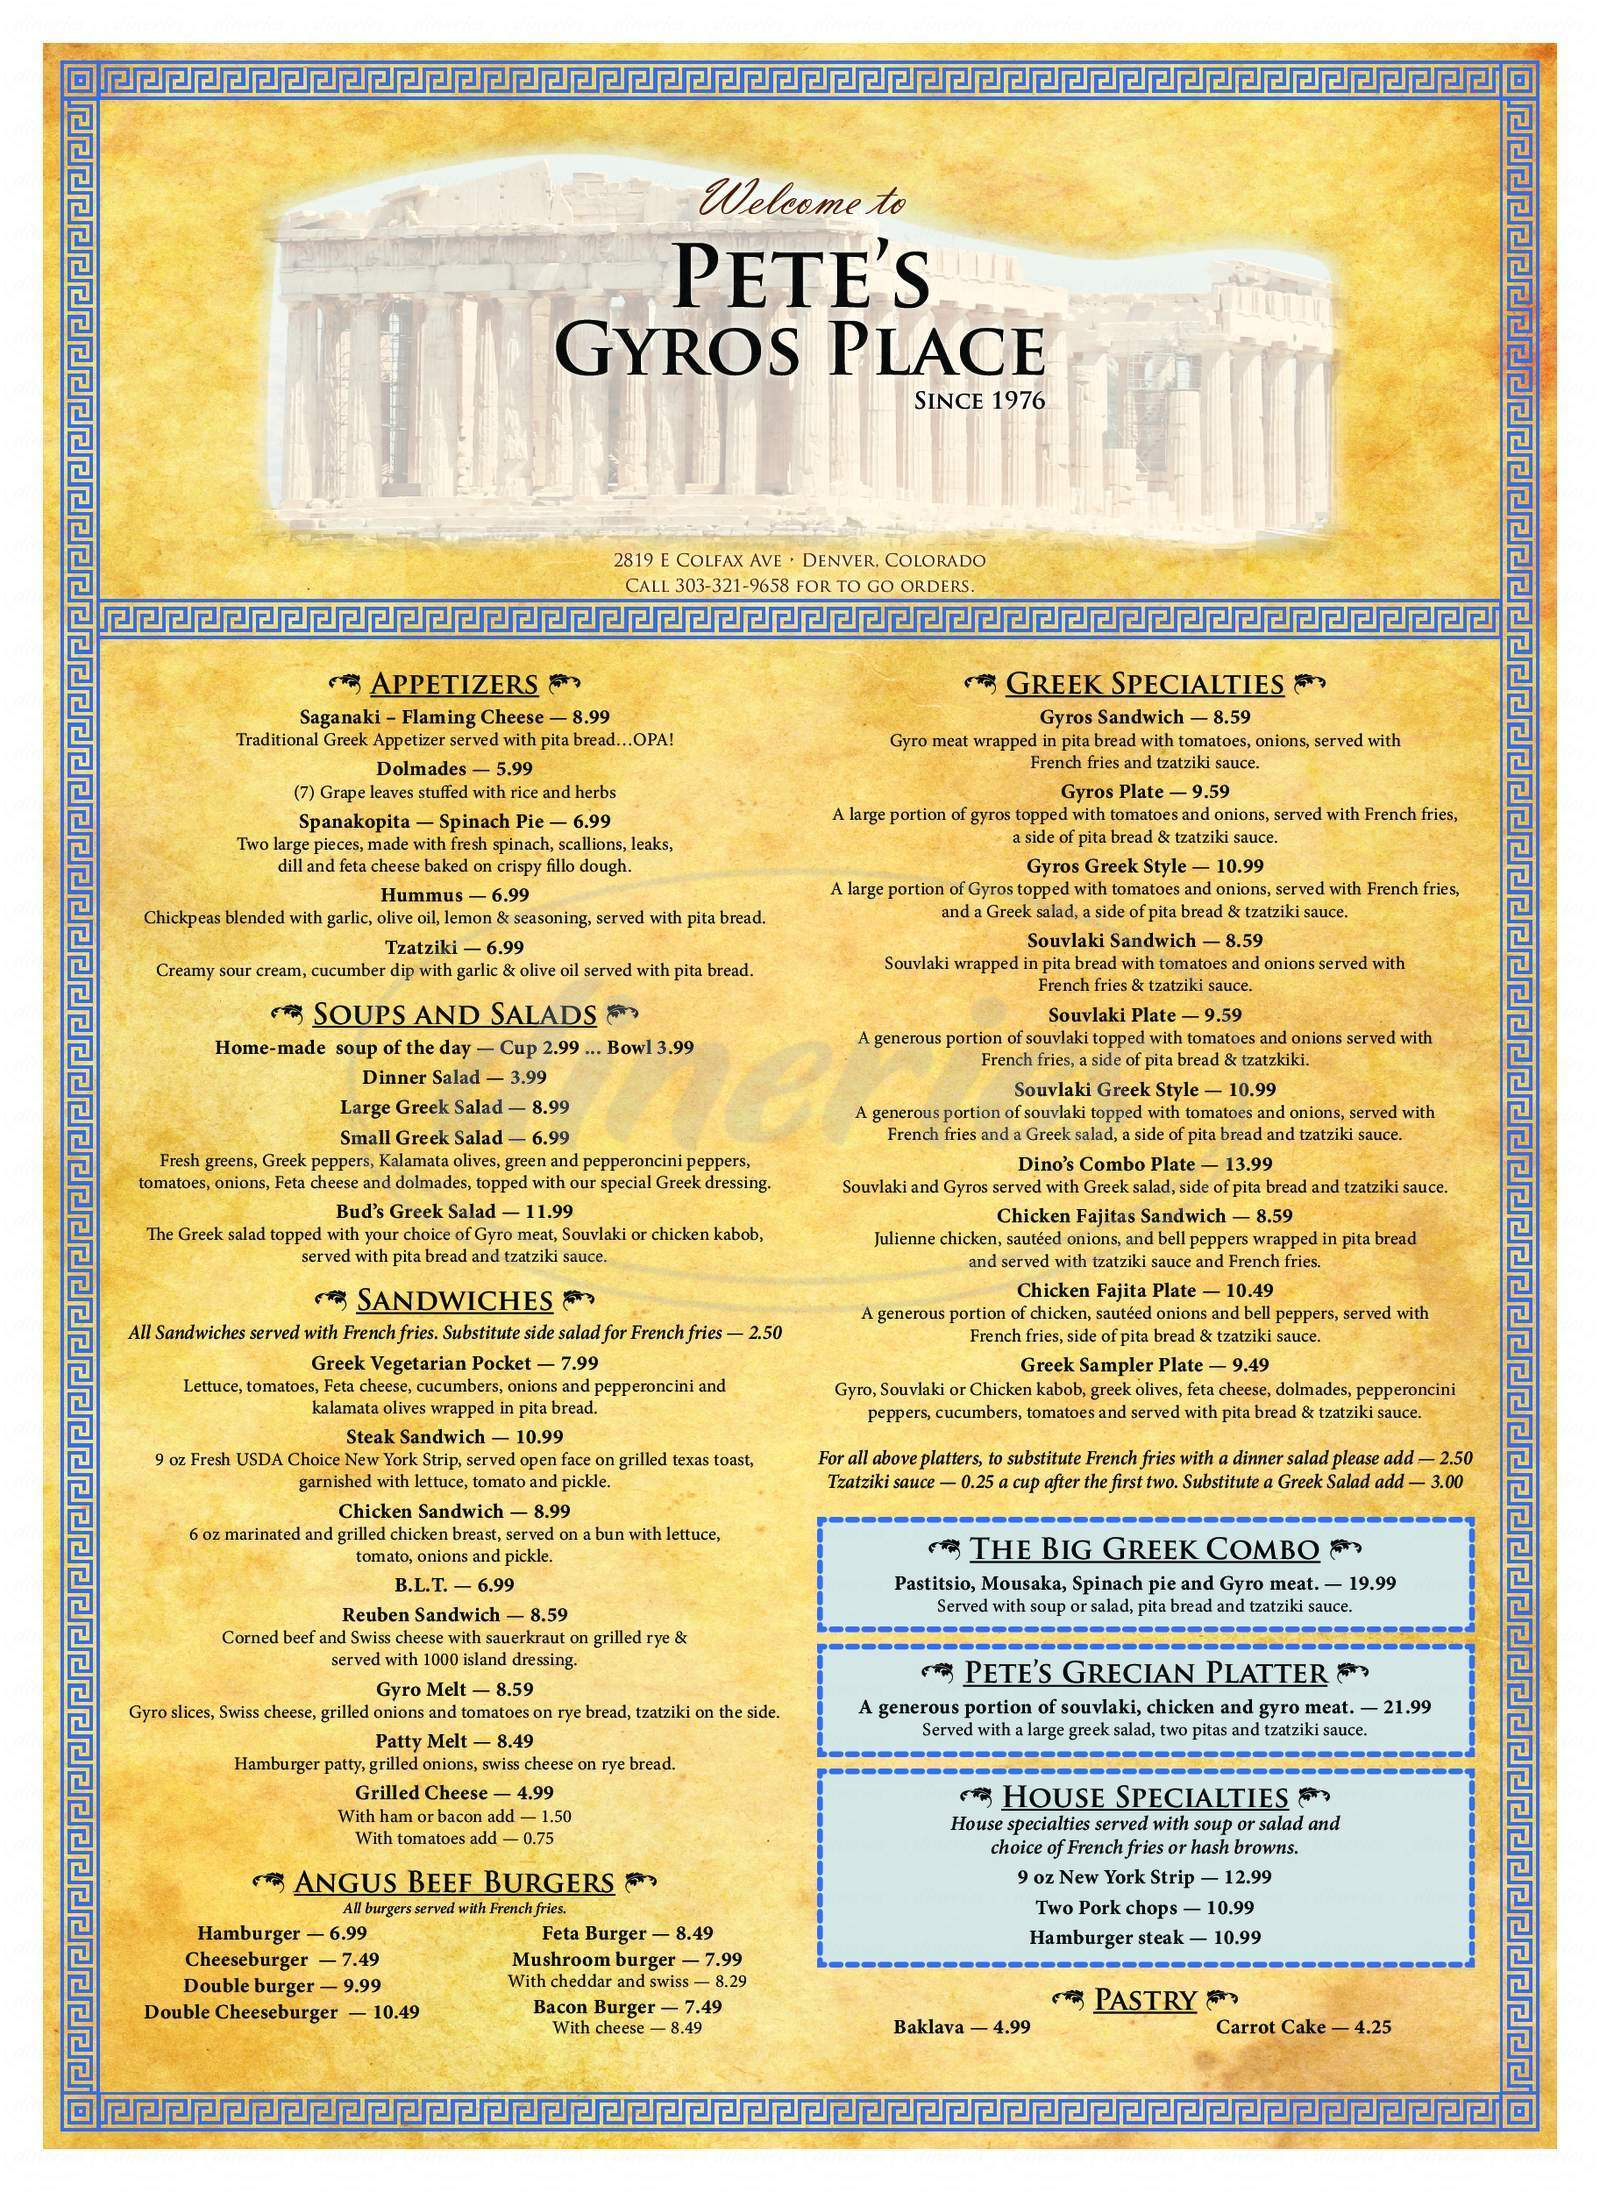 menu for Pete's Gyros Place